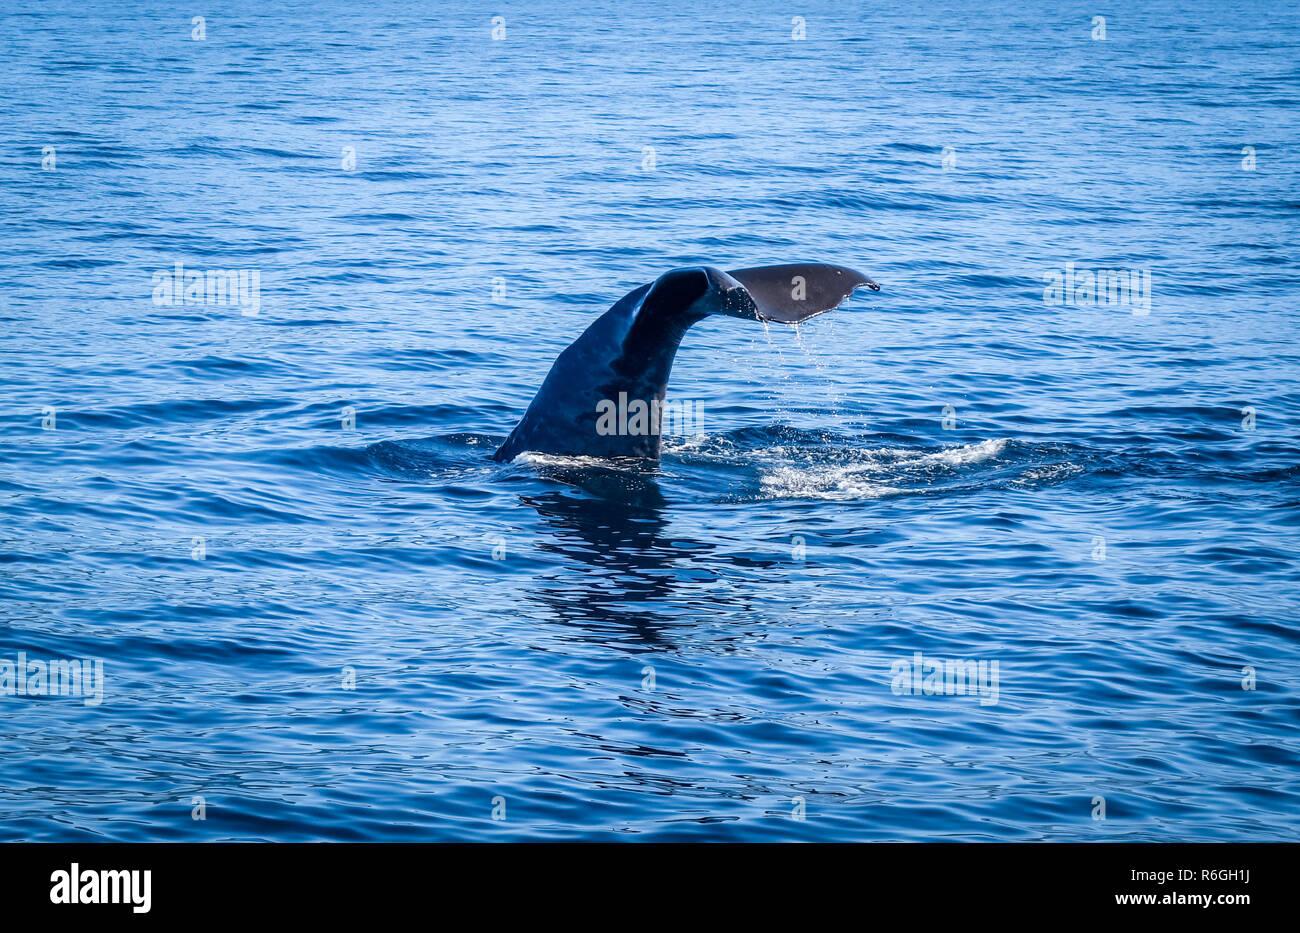 Whale in Kaikoura bay, New Zealand Stock Photo